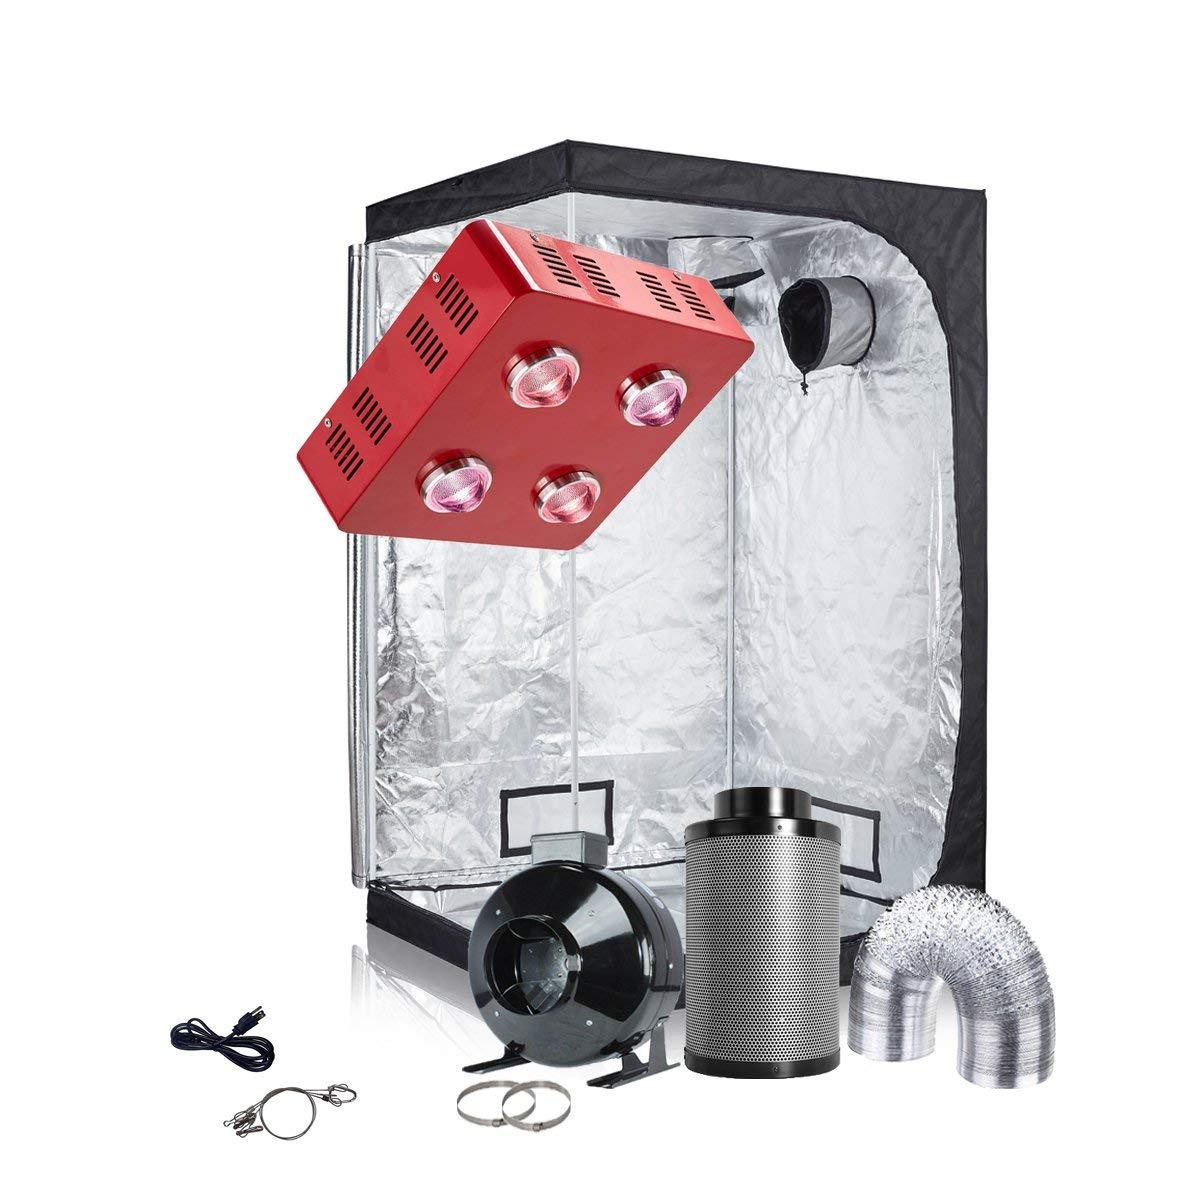 Get Quotations · TopoGrow 4u0027X4u0027 Grow Tent Kit Setup Complete Package LED 800W Grow Light Kit  sc 1 st  Alibaba.com & Cheap 4x4 Grow Tent find 4x4 Grow Tent deals on line at Alibaba.com